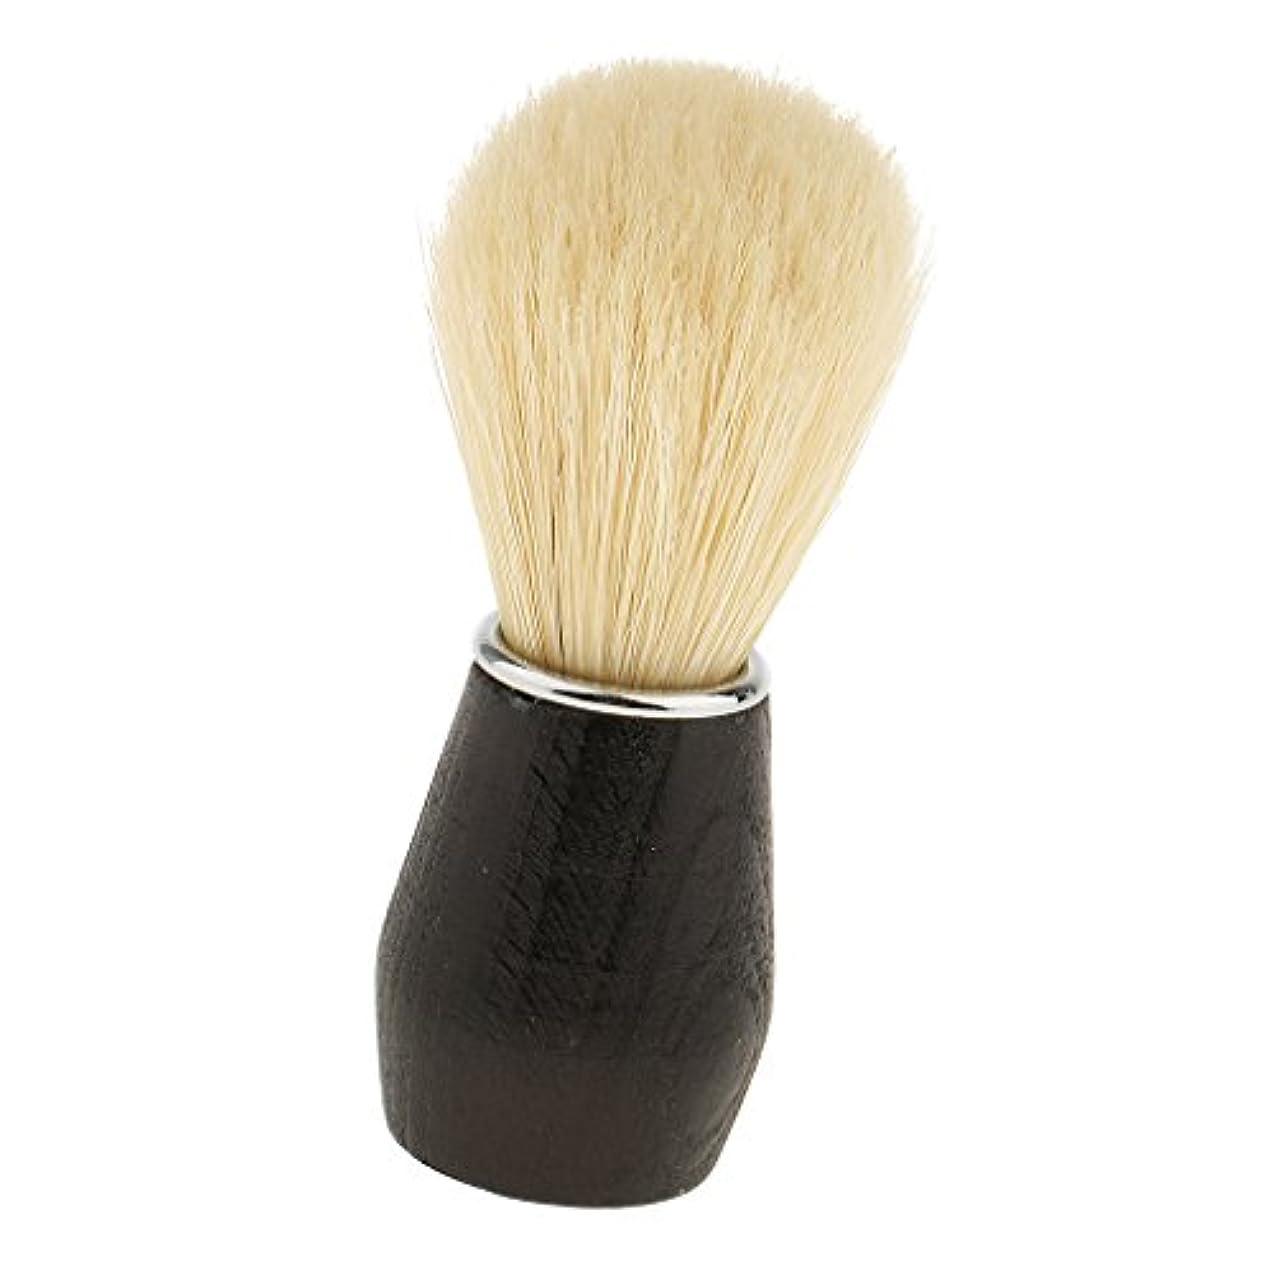 Baosity 父のギフト ソフト 実用的 プロフェッショナル バーバーサロン家庭用 ひげ剃りブラシ プラスチックハンドル フェイシャルクリーニングブラシ ブラック